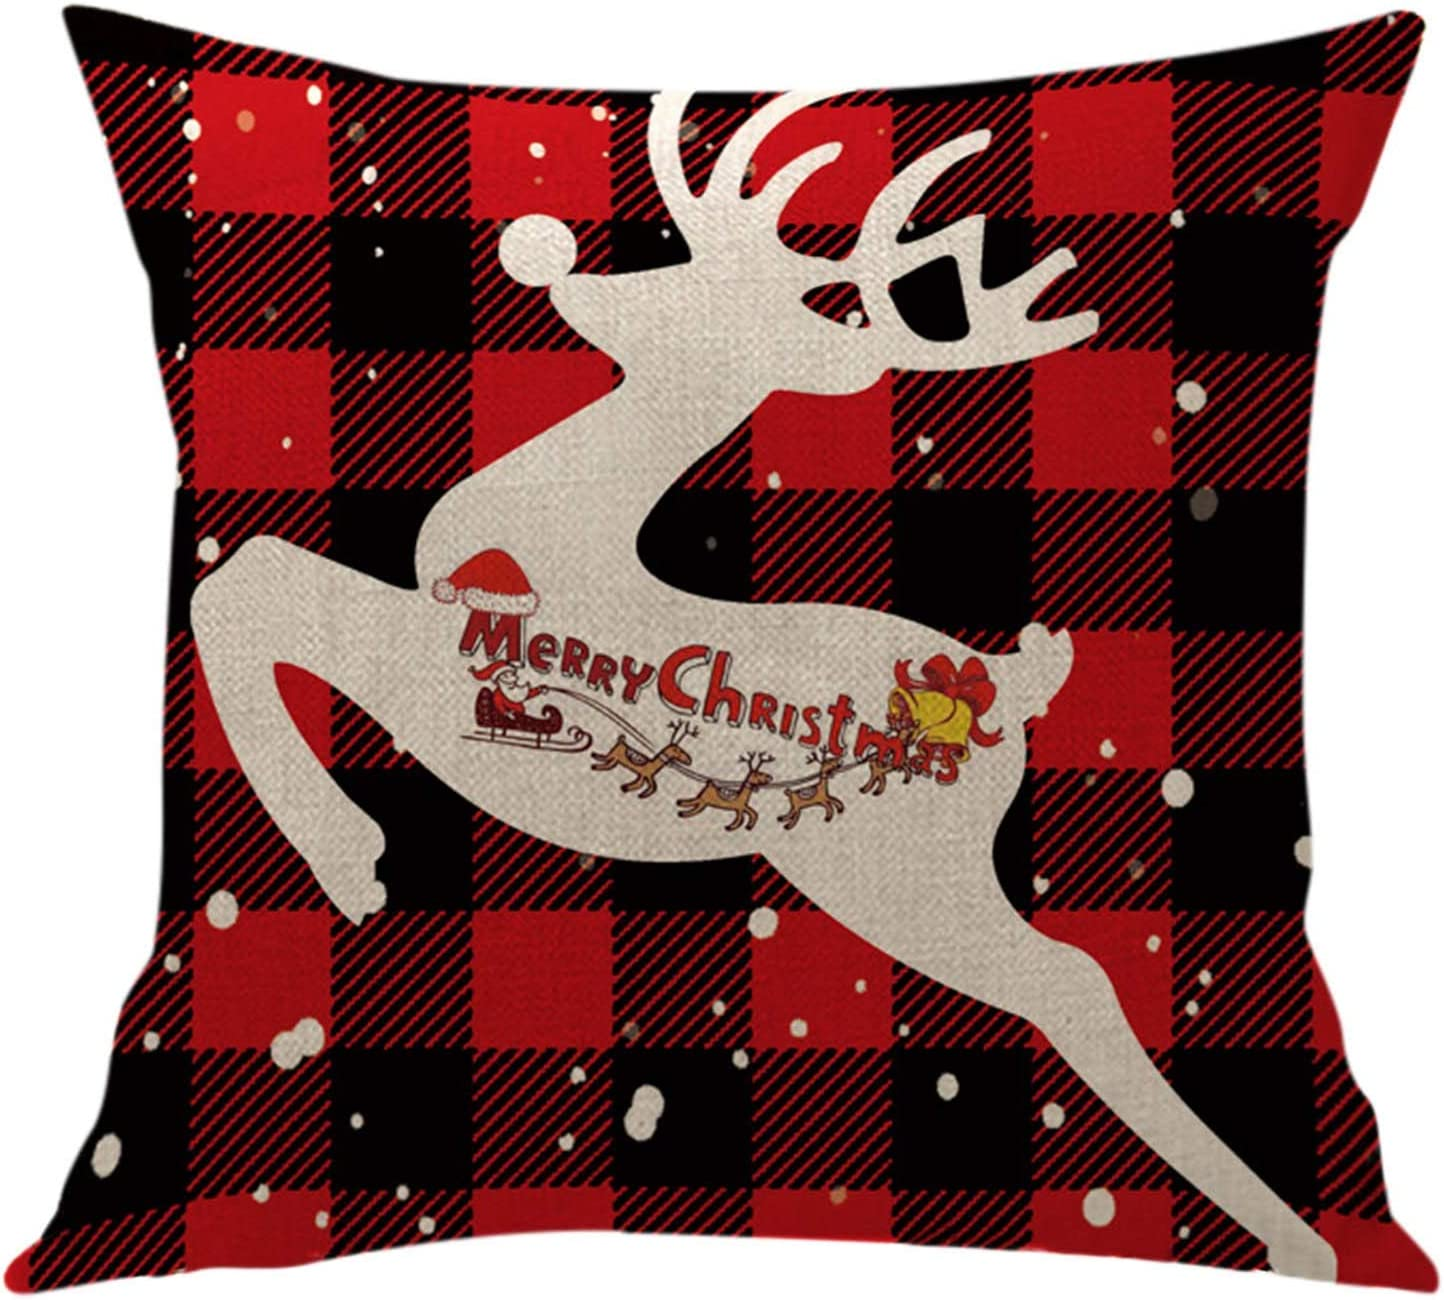 HSMQ 1PC Christmas Throw Pillow Trust Dedication Covers 18x18 Inches De